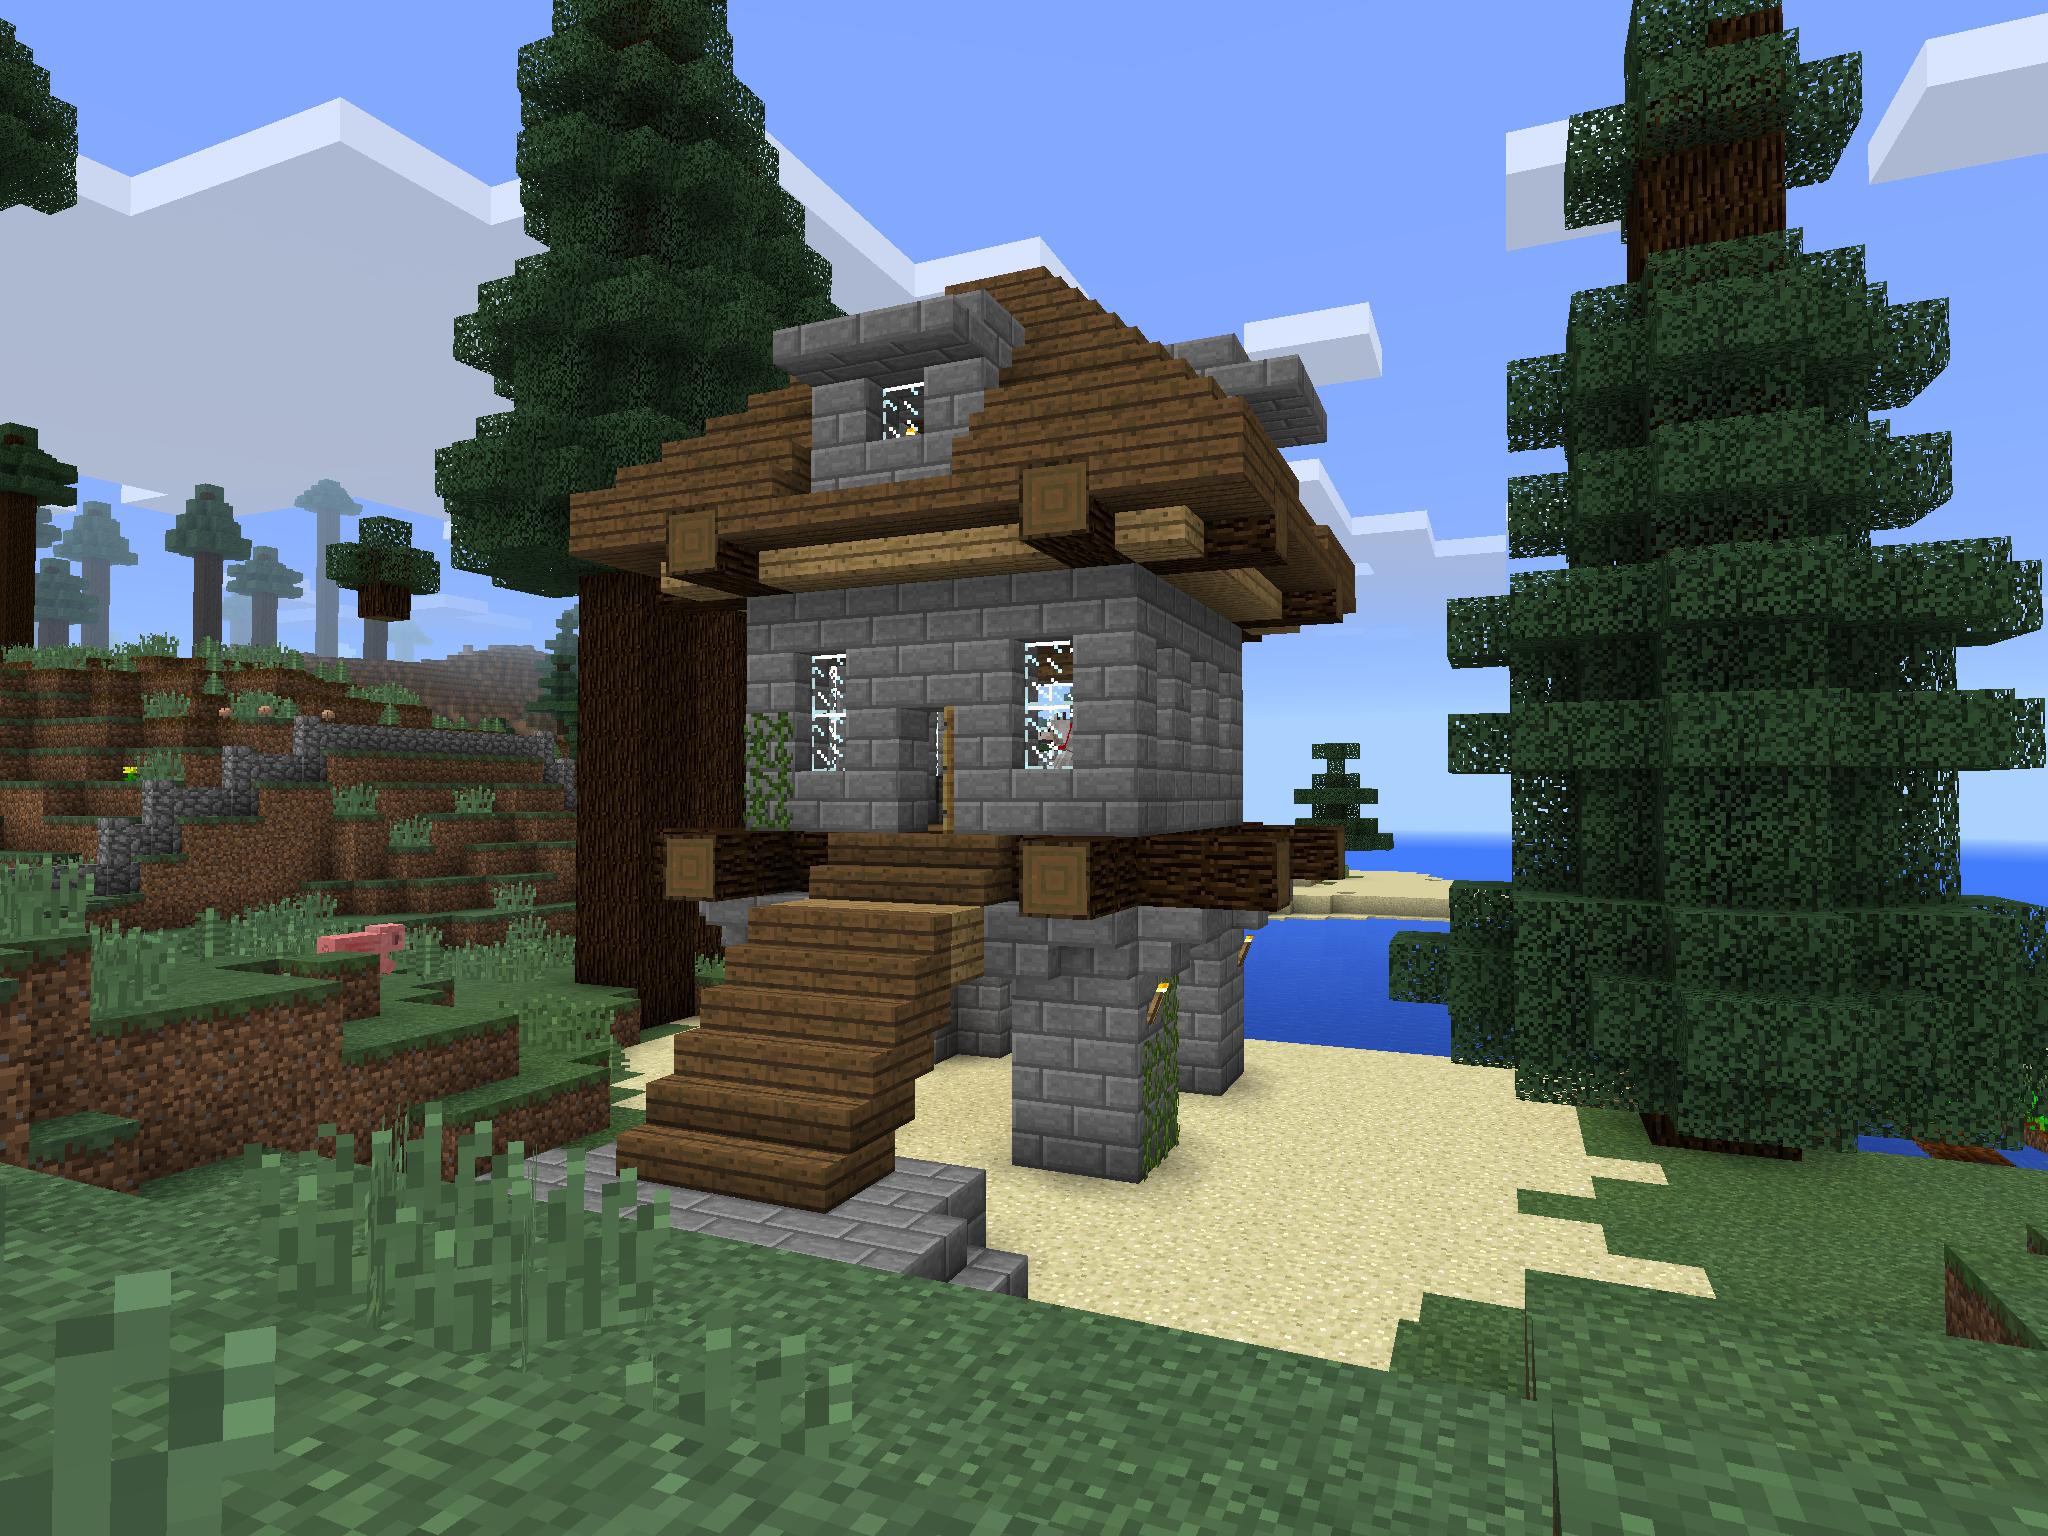 Minecraft PE House - 2 Story Raised   Minecraft house ...